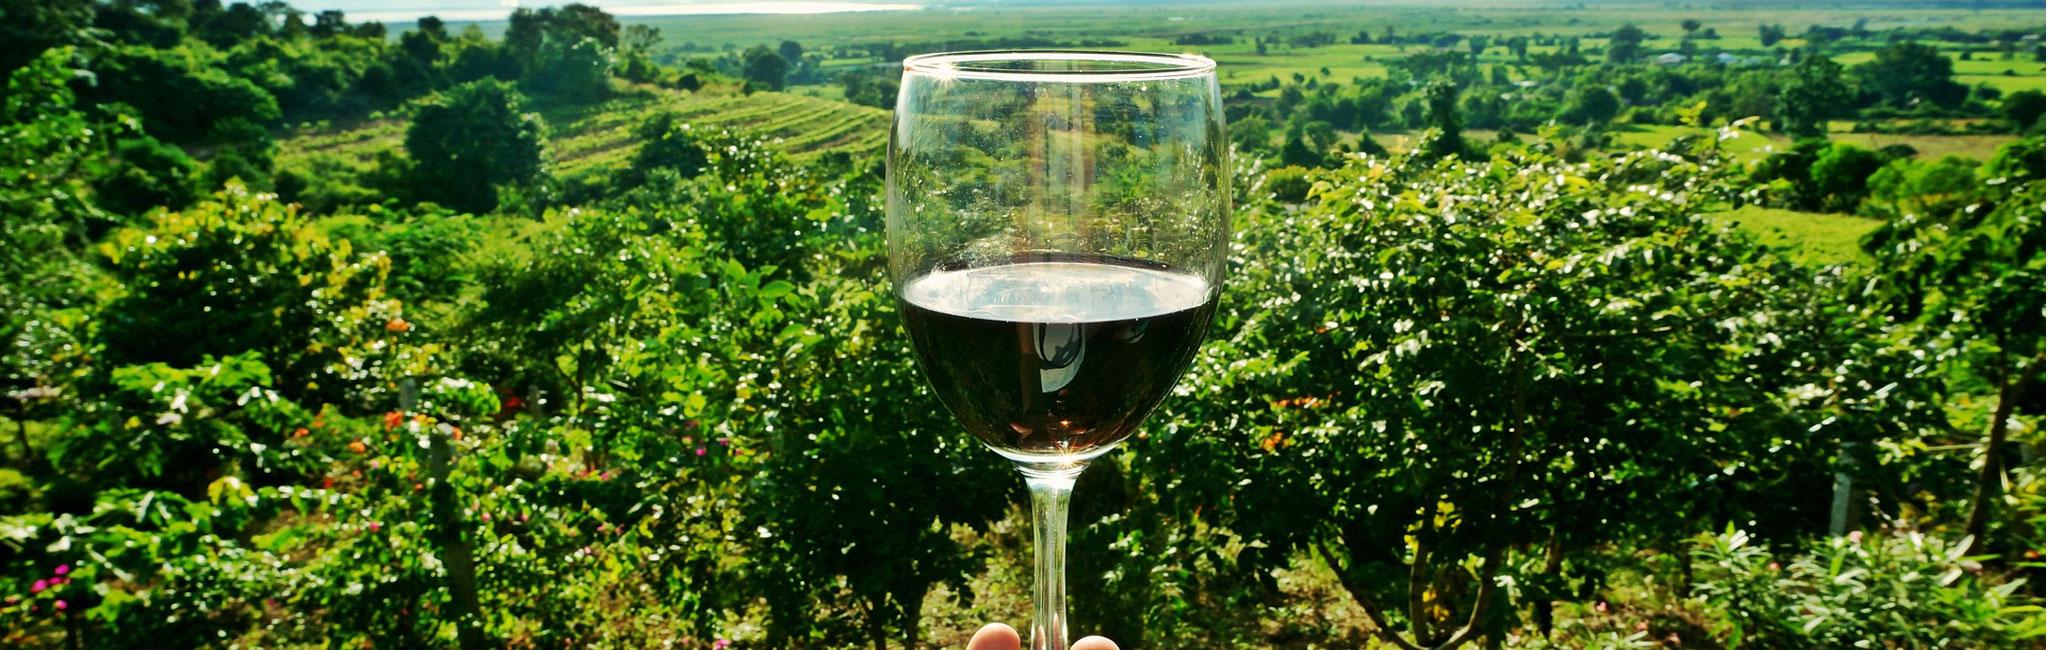 Sedona-Wine-Tasting-Tour